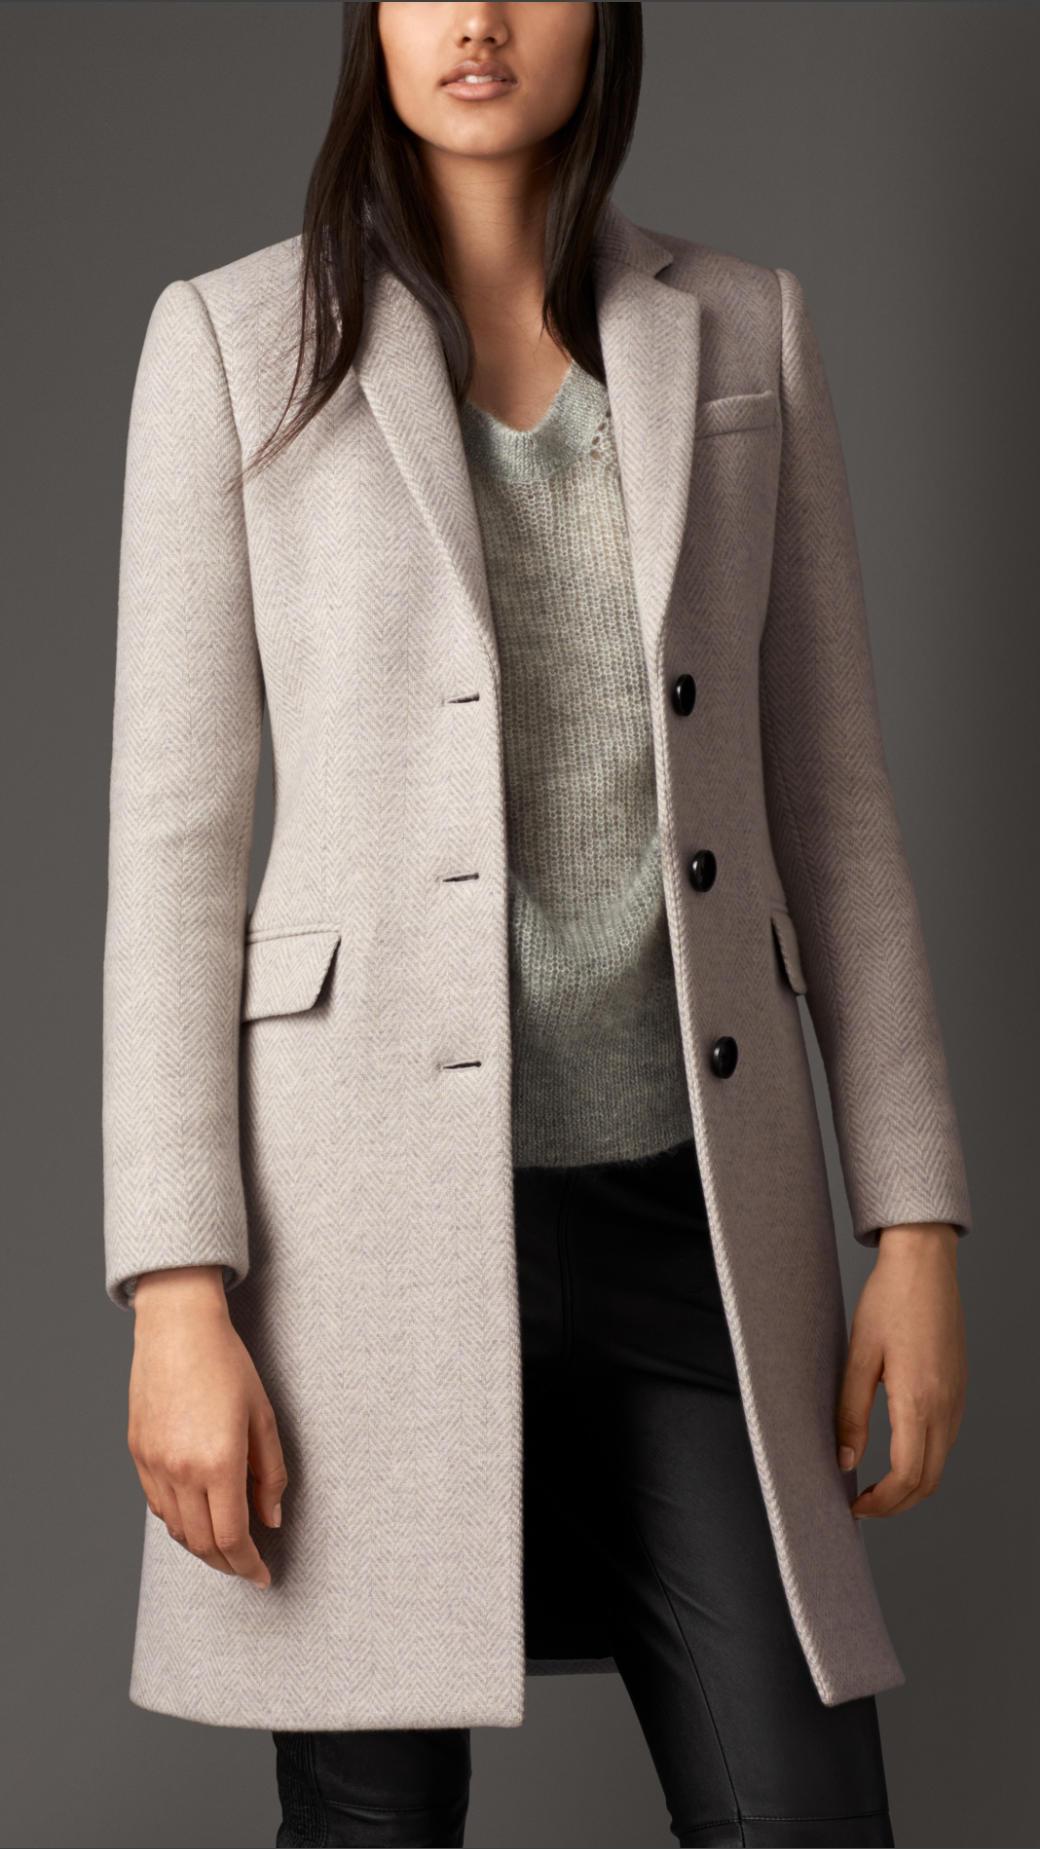 burberry-white-virgin-wool-cashmere-herringbone-chesterfield-product-1-26869172-1-419361287-normal.jpeg